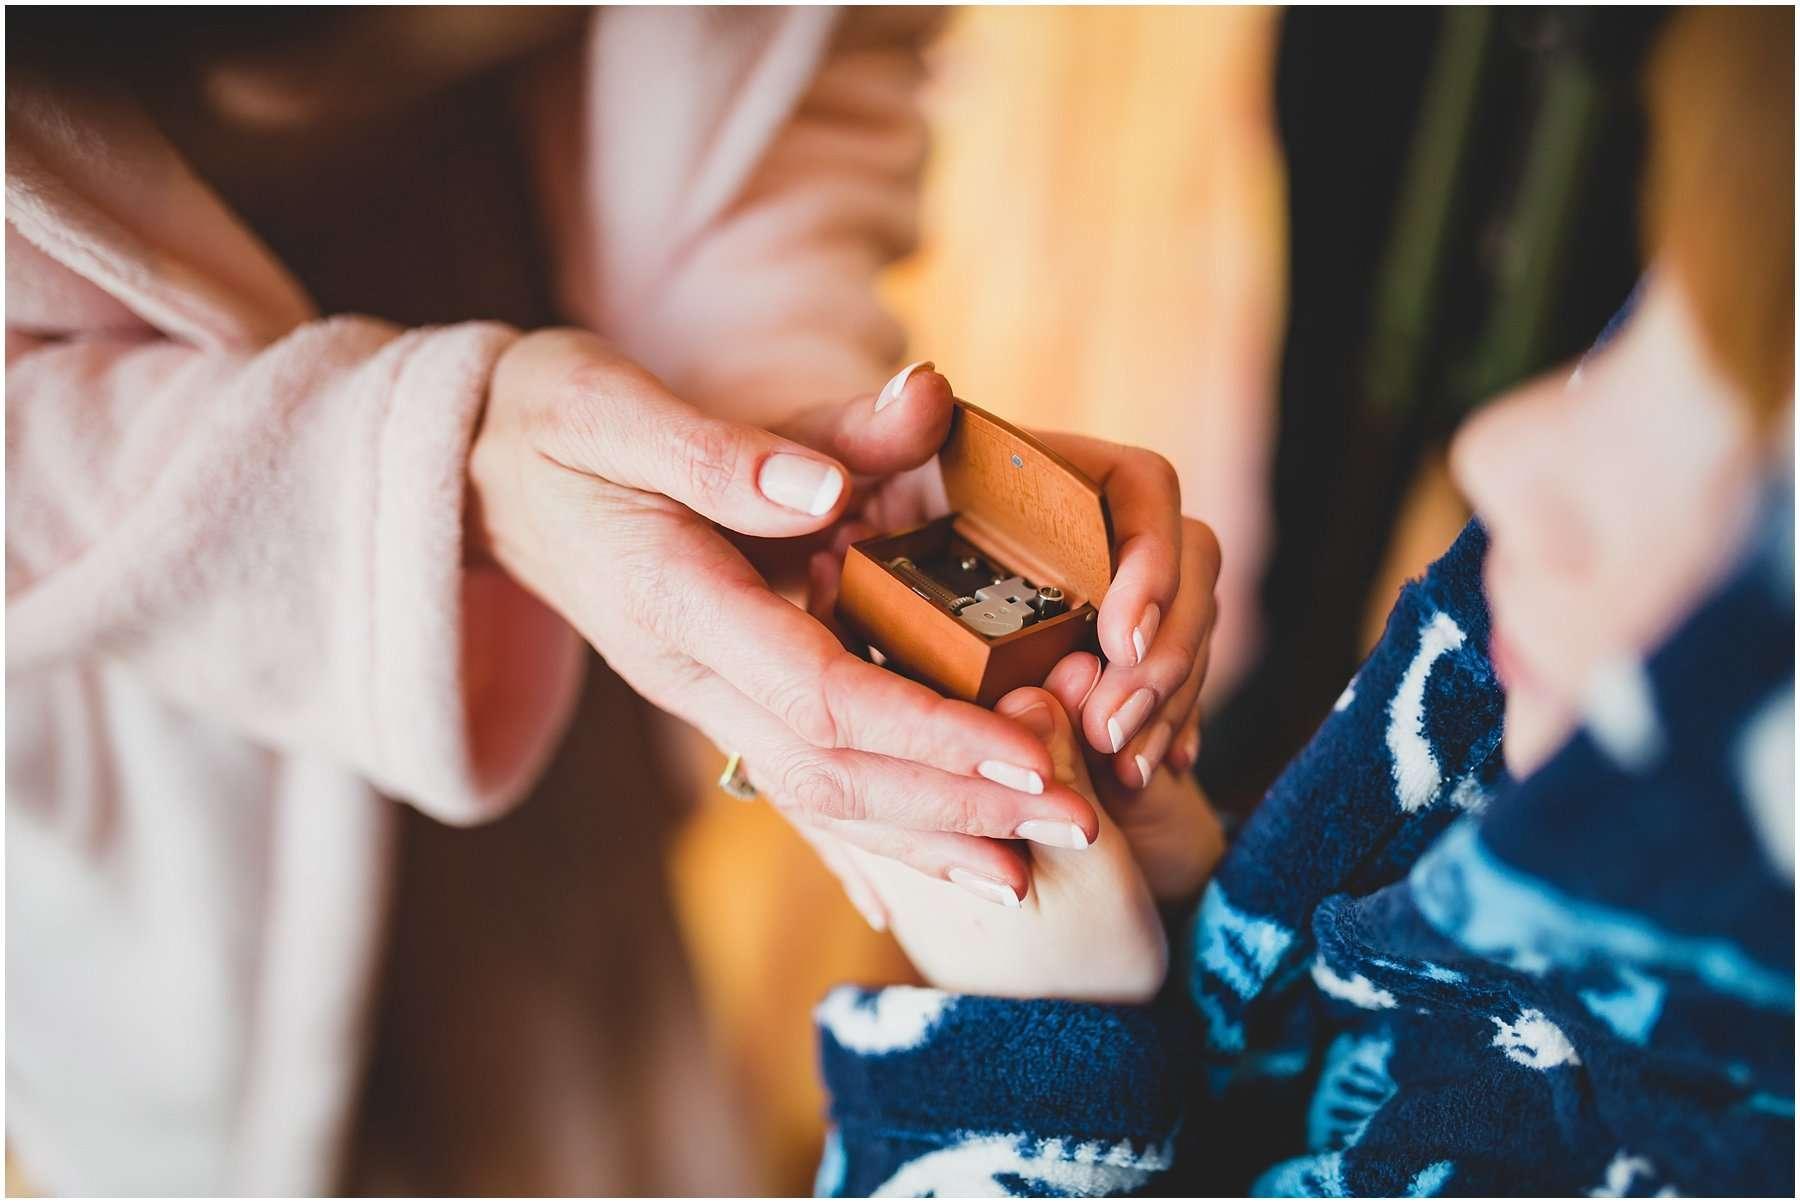 SARAH AND IAN SOUTHWOOD HALL WEDDING - NORFOLK WEDDING PHOTOGRAPHER 2